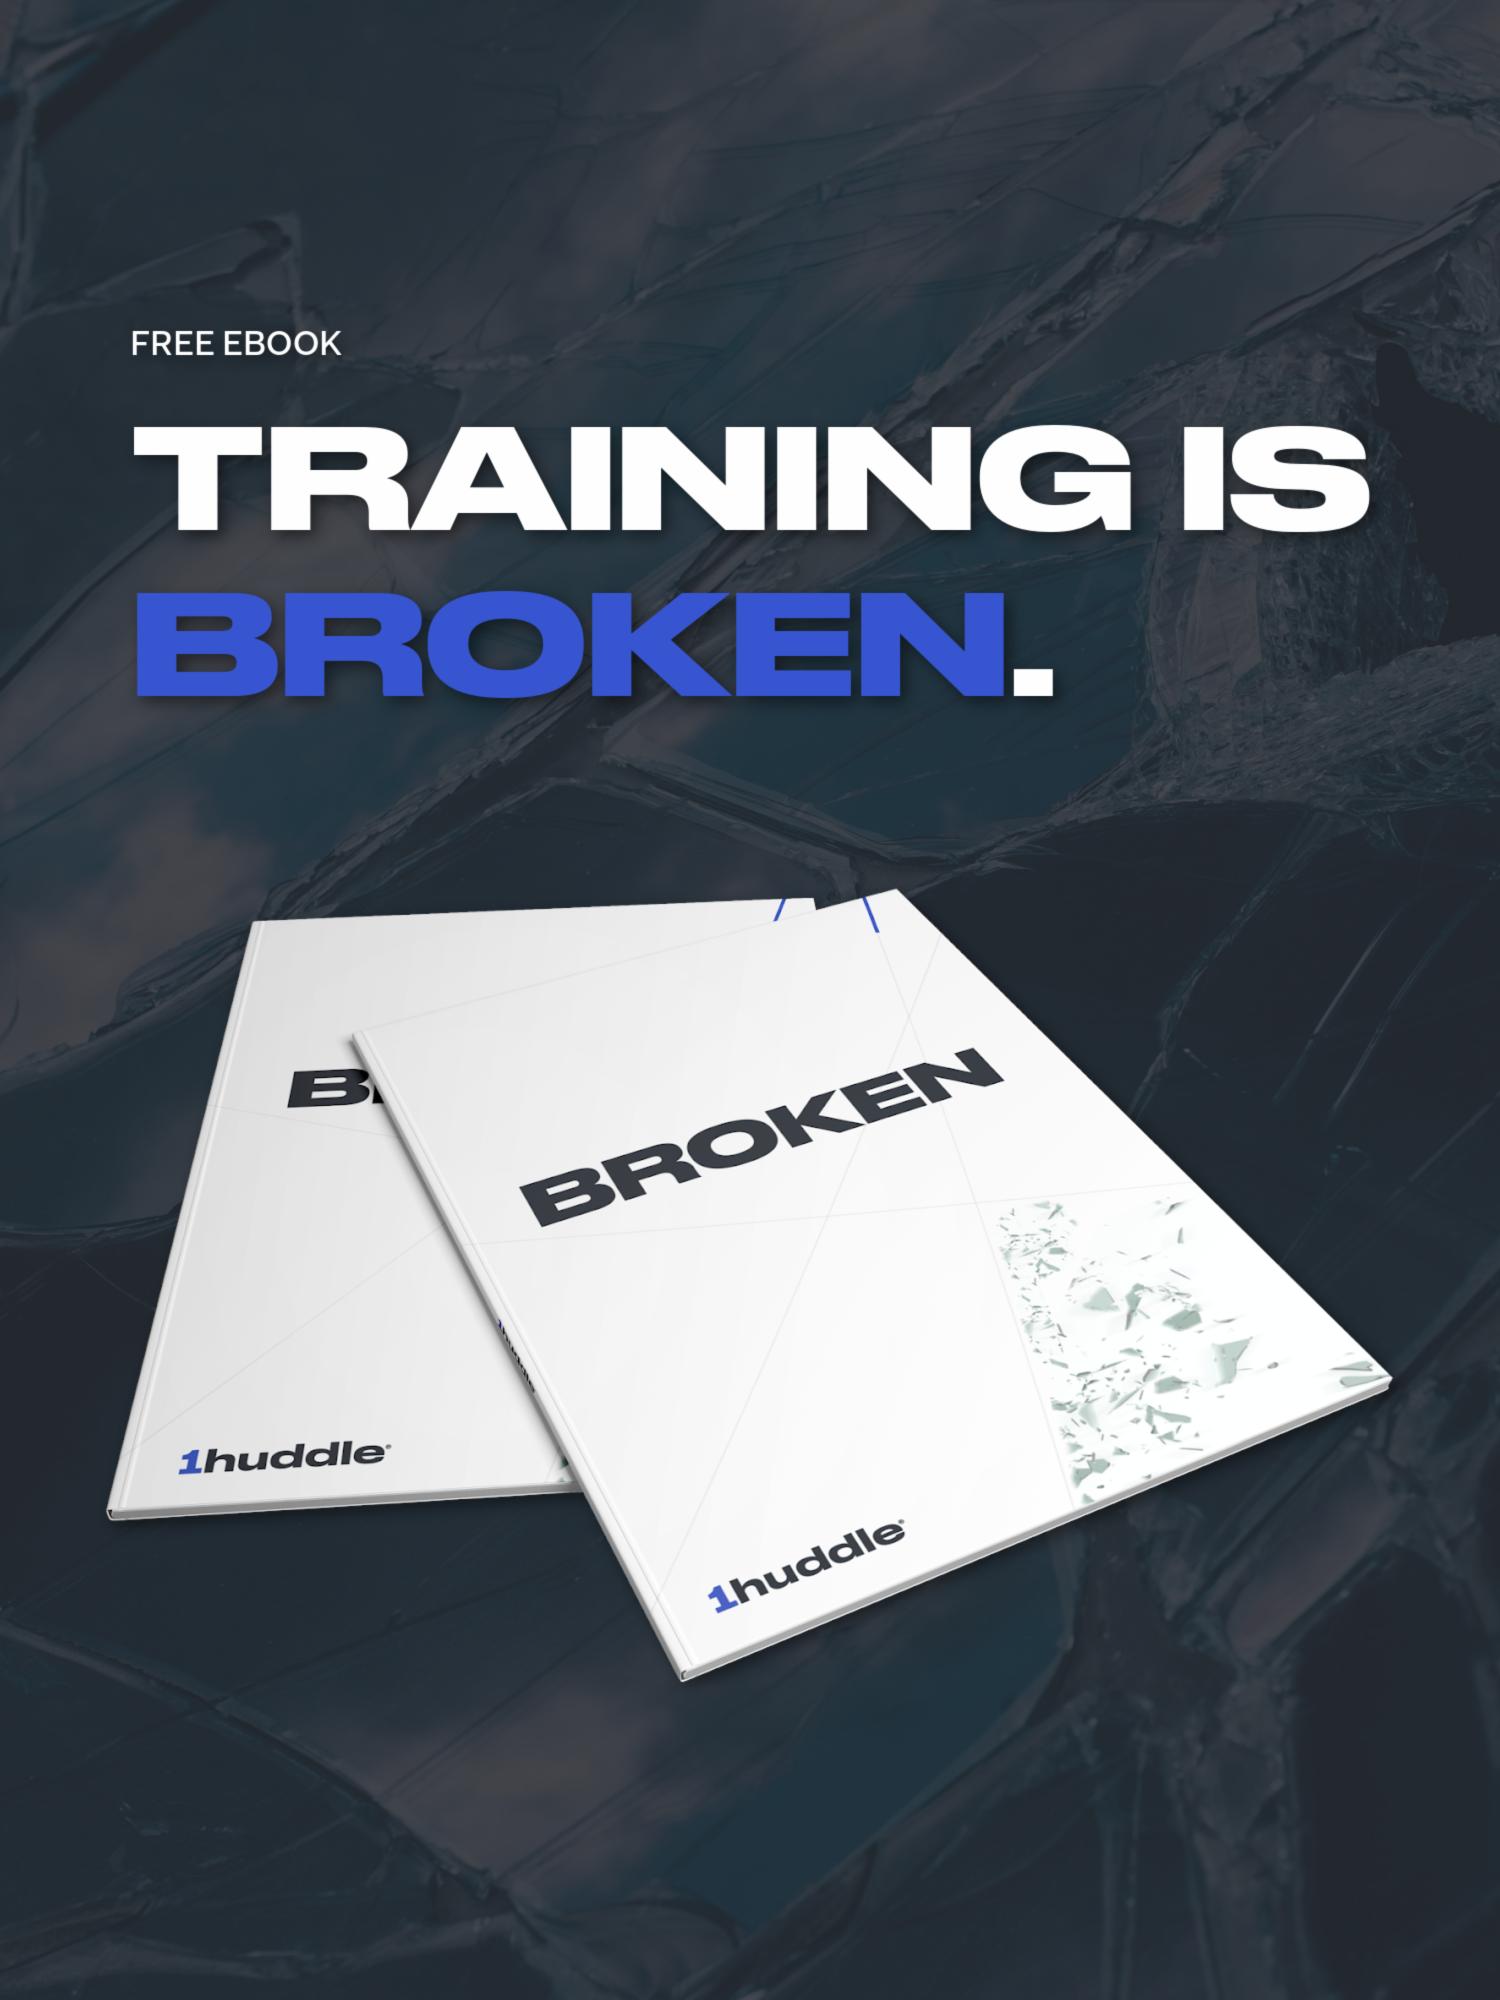 Broken-Aug-04-2020-06-30-21-21-PM